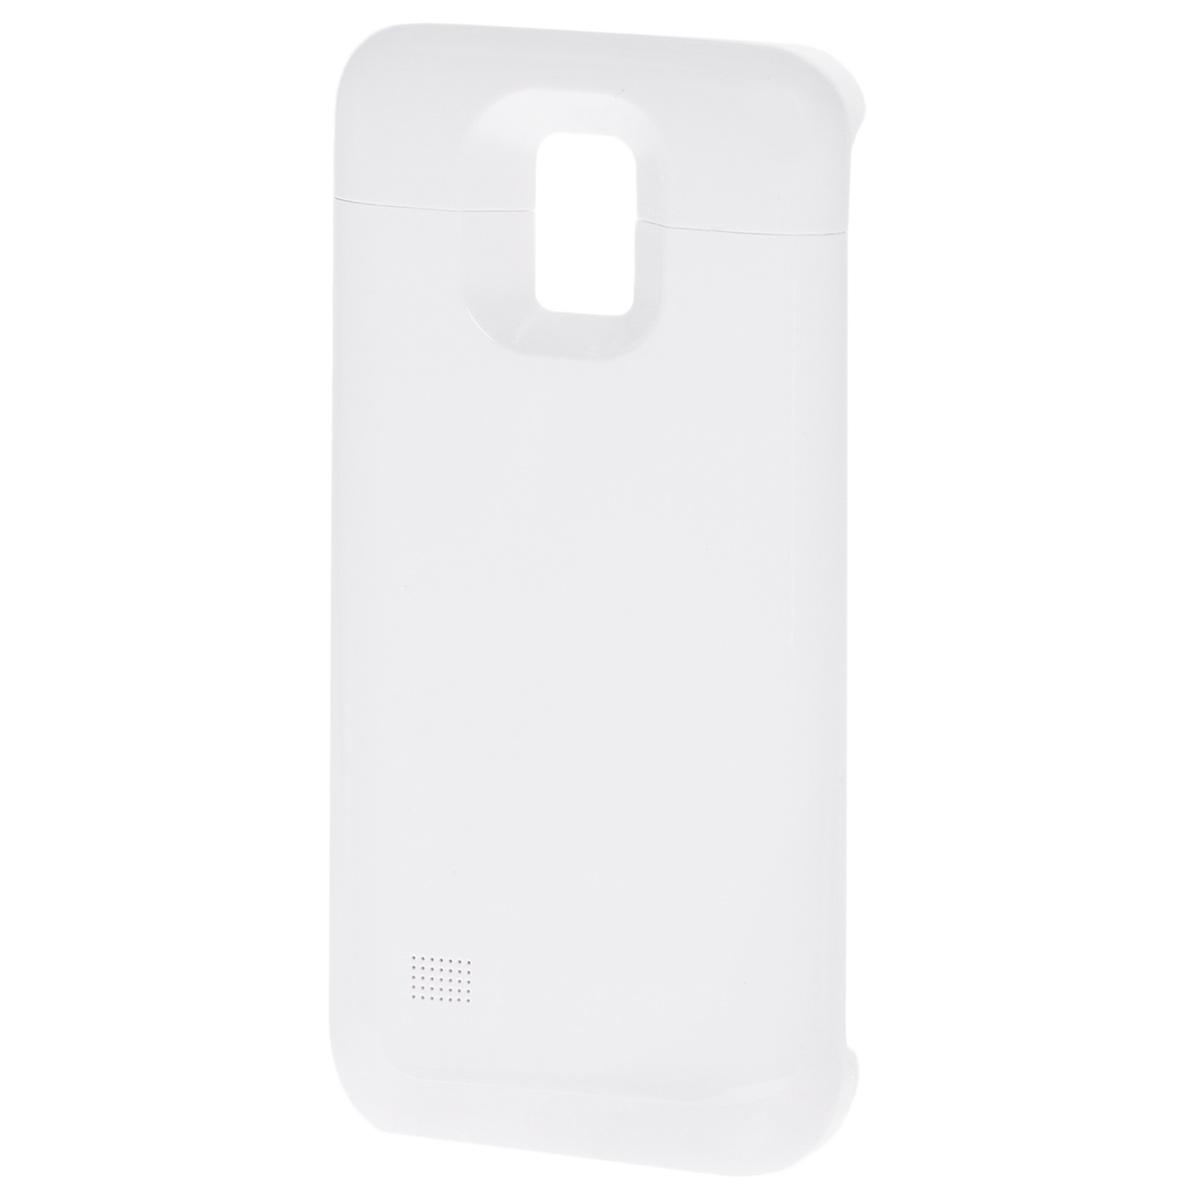 все цены на EXEQ HelpinG-SC09 чехол-аккумулятор для Samsung Galaxy S5 mini, White (3300 мАч, клип-кейс) онлайн